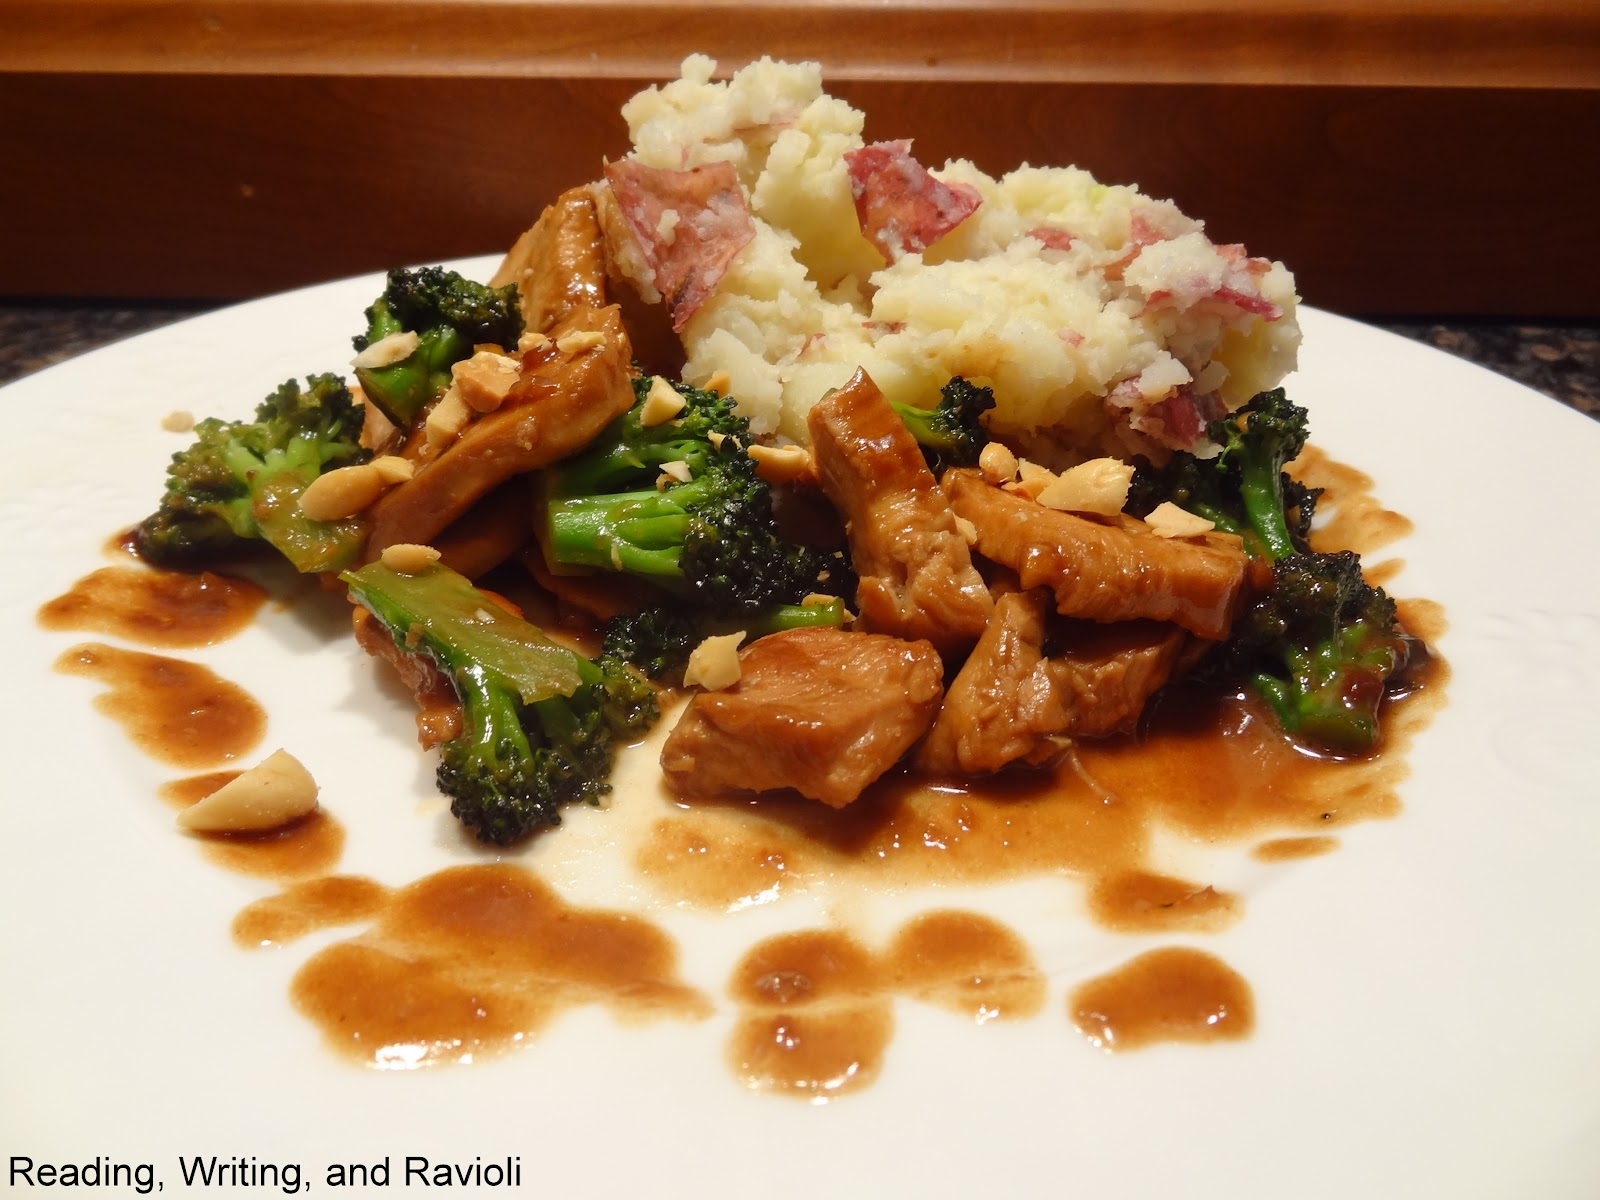 ... and Broccoli Stir Fry with Hoisin Sauce and Wasabi Smashed Potatoes